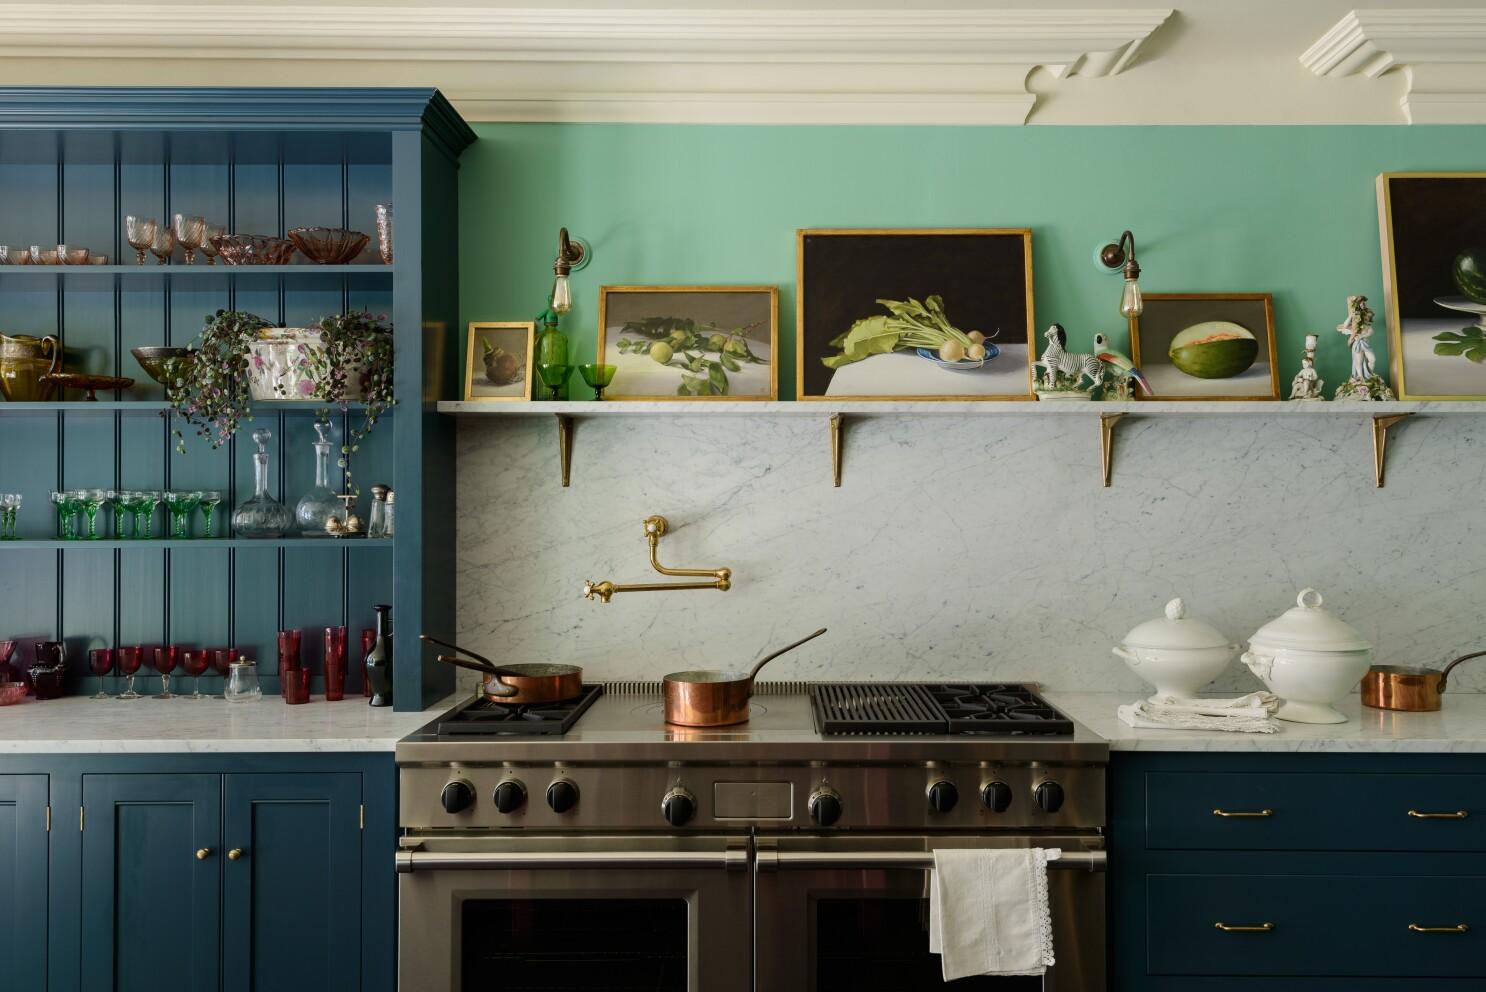 Backsplashes, a one-step kitchen makeover